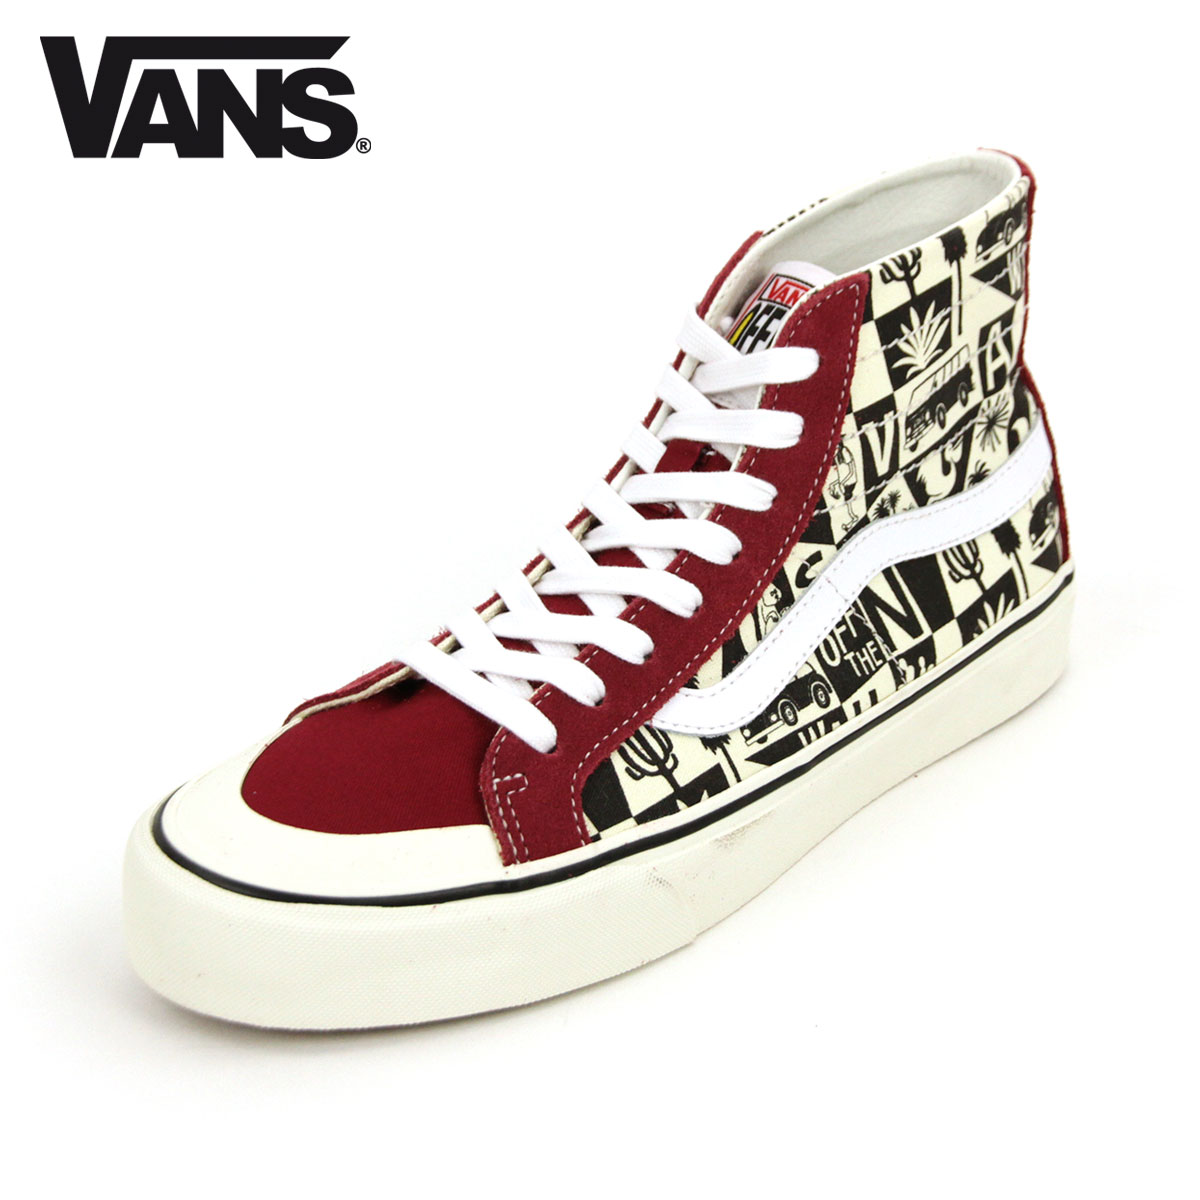 Vans VANS regular store men sneakers skating high VANS SK8 HI 138 DECON SF RUMBA REDMARSHMALLOW VN0A3MV1VSF